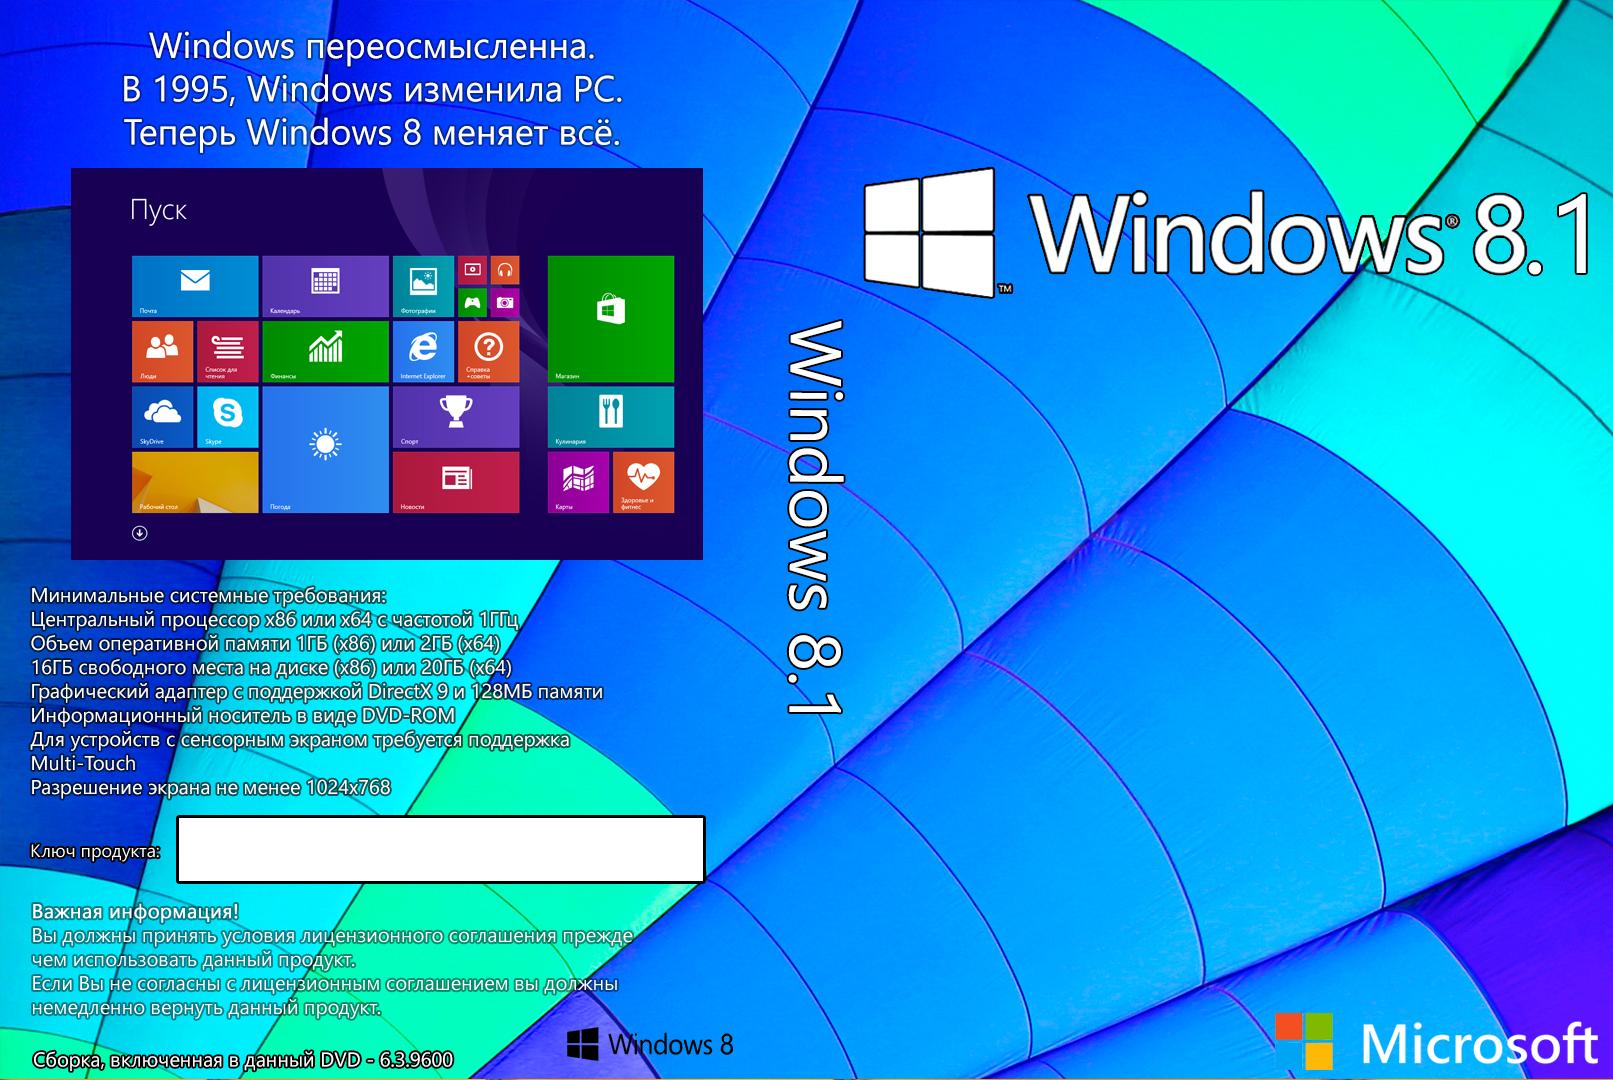 windows 8.1 iso free 64 bit